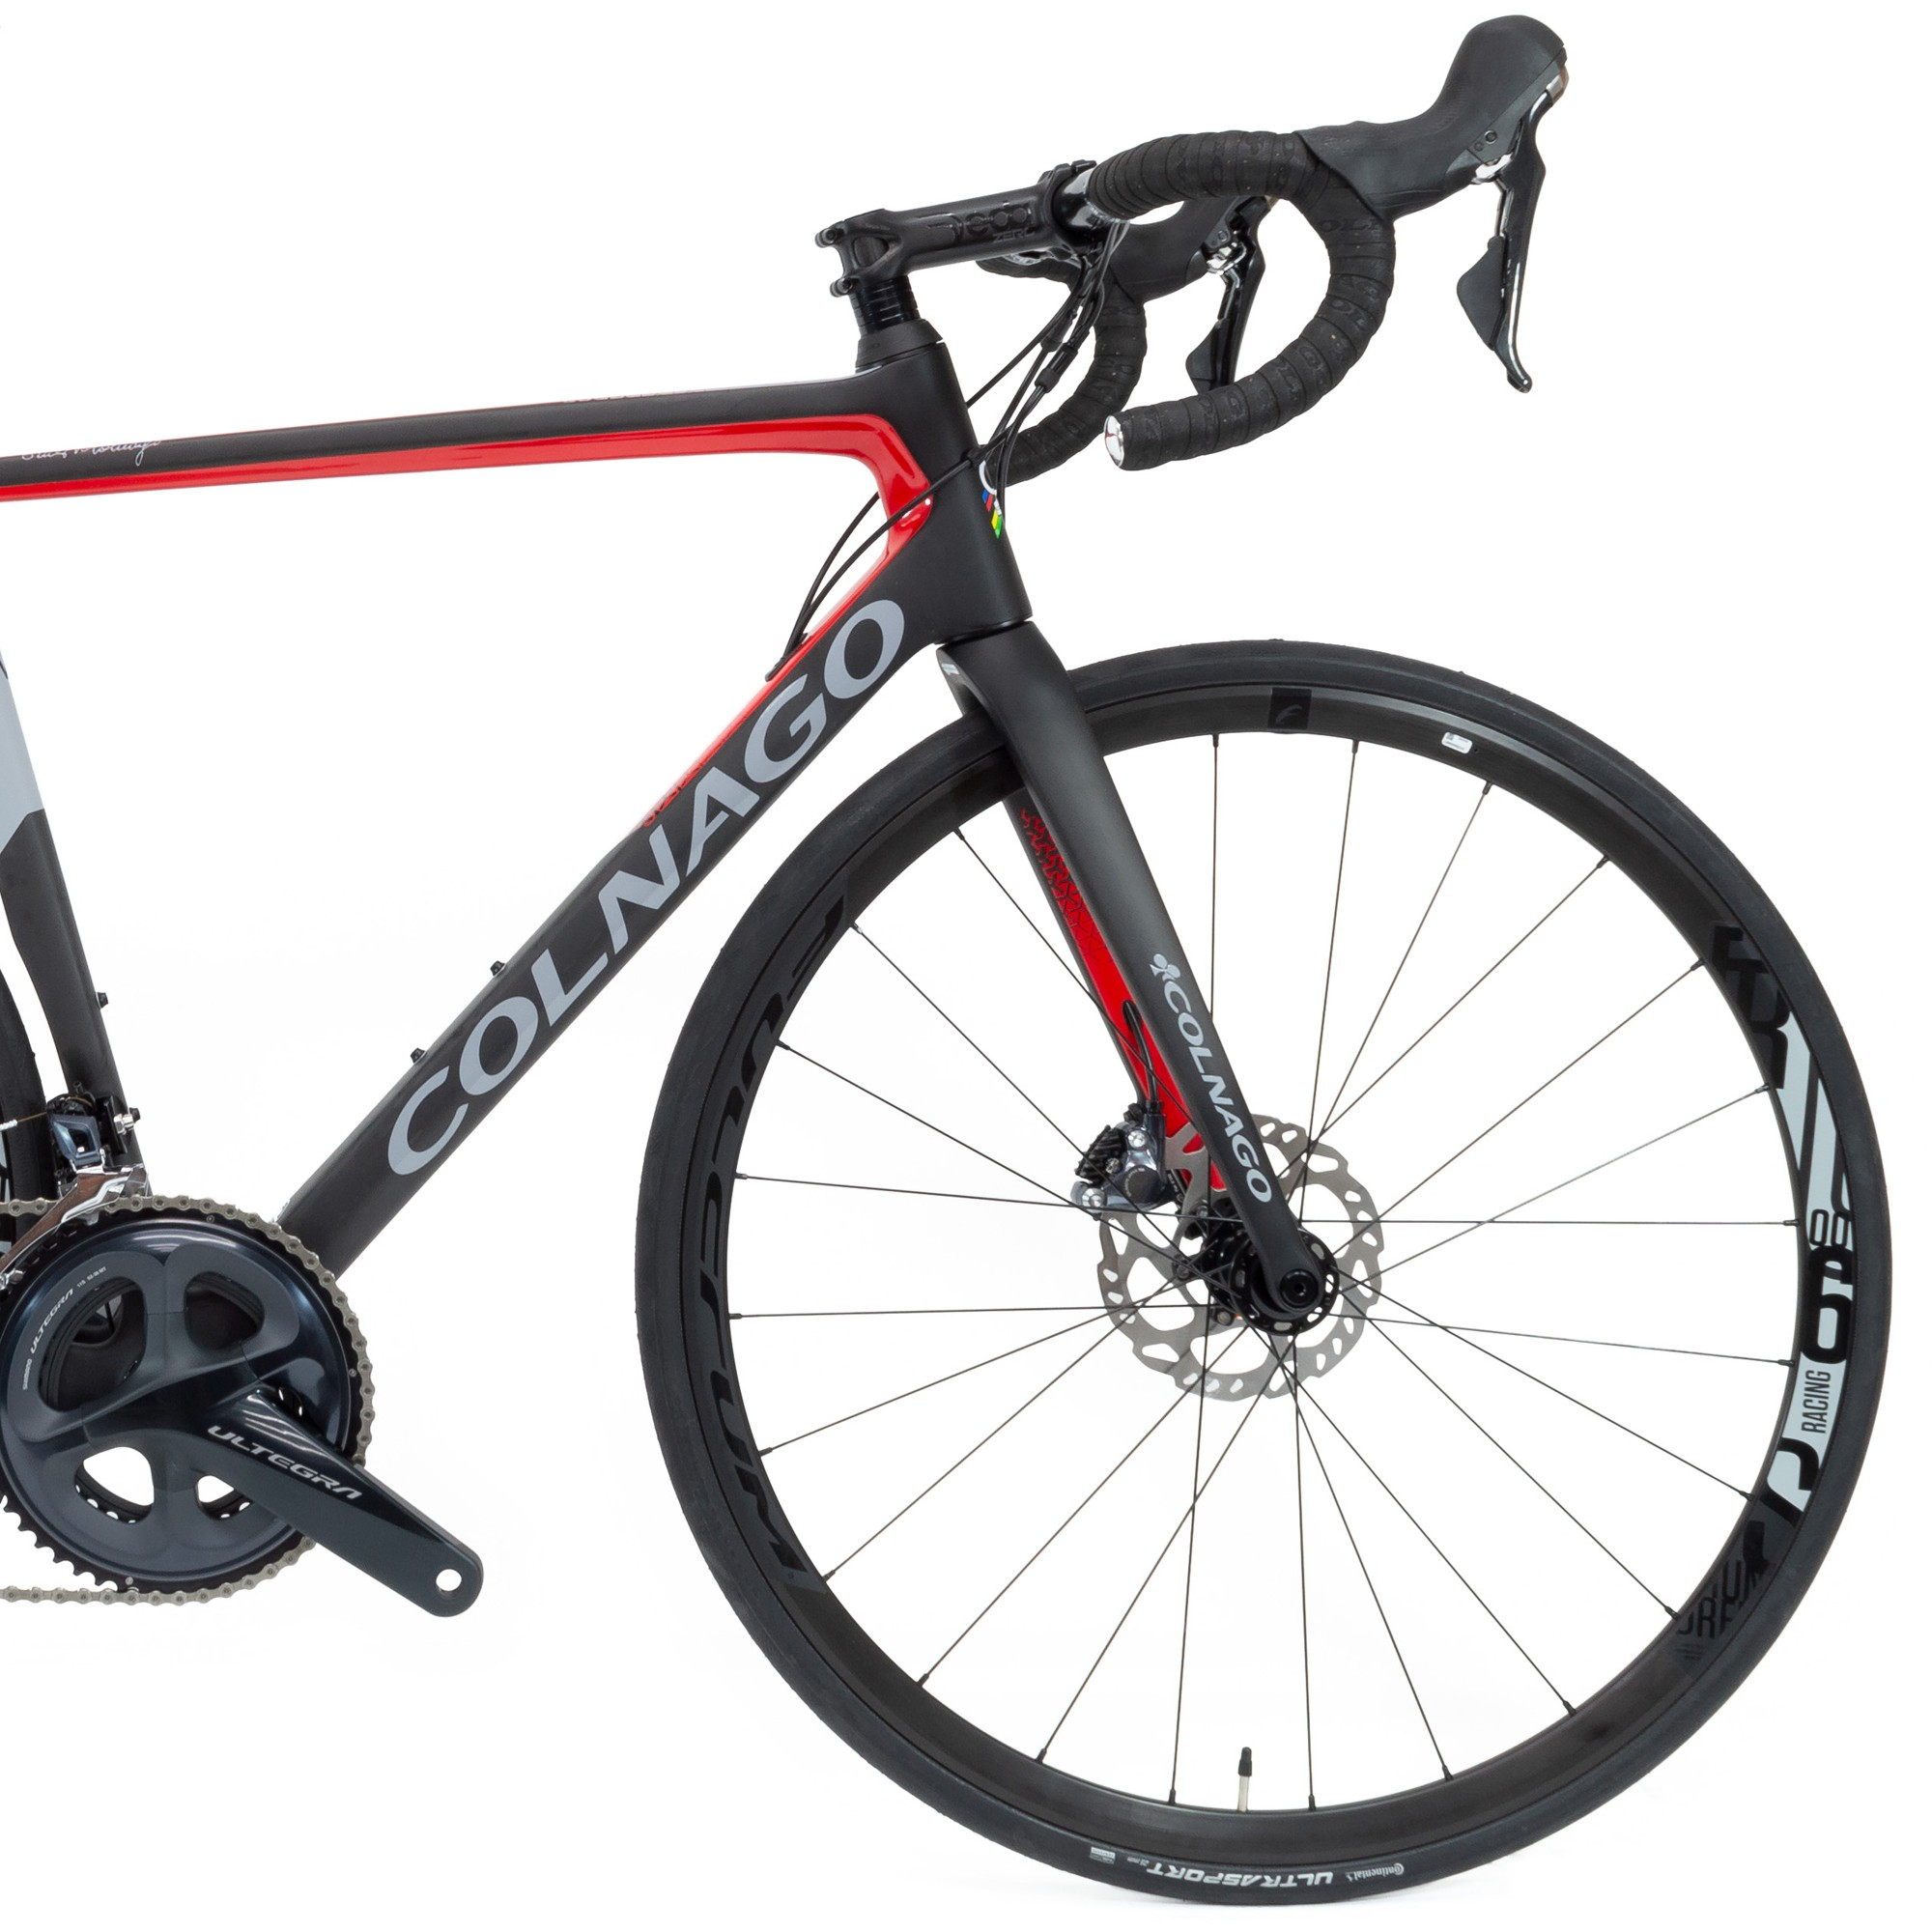 Colnago-V3-Disc-Ultegra-Road-Bike-2020 - 2